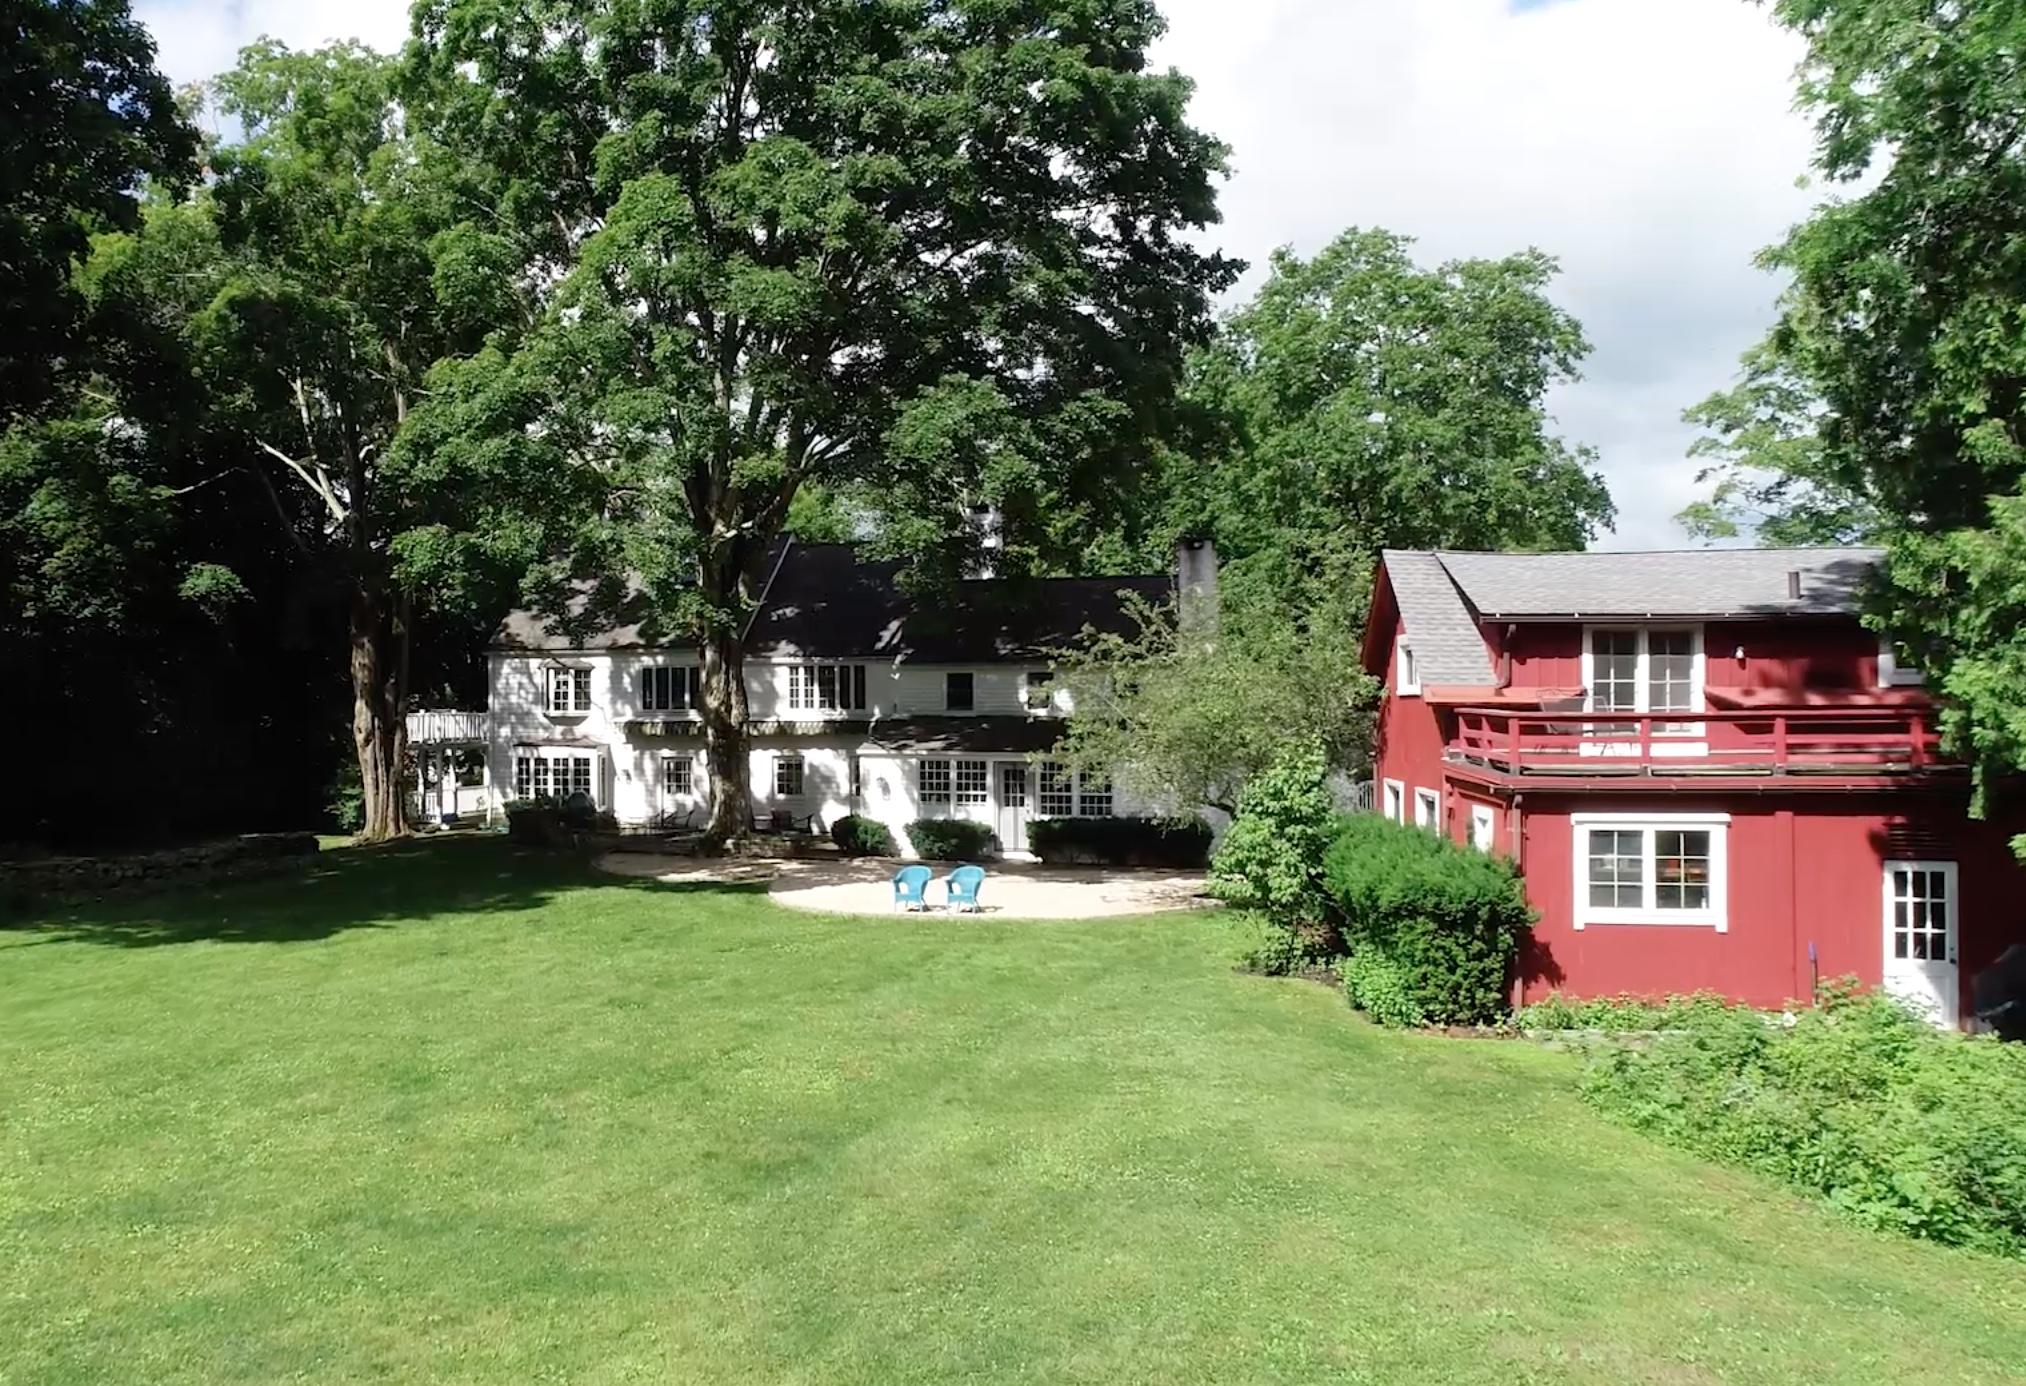 Summer focus on Red cottage.jpg